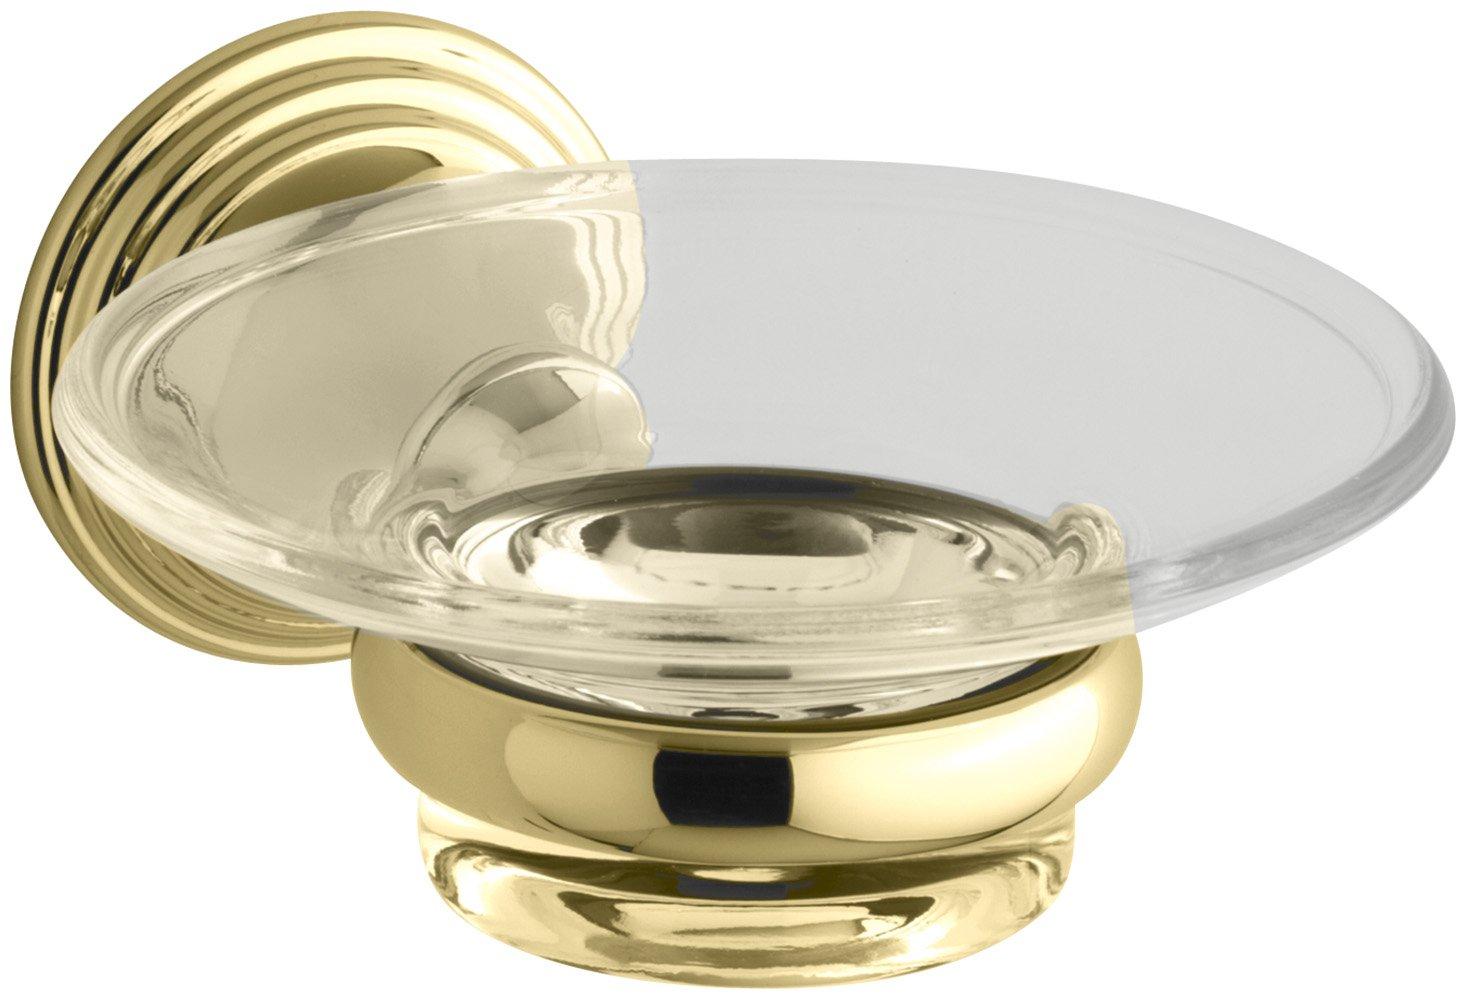 KOHLER K-10560-PB Devonshire Soap Dish, Vibrant Polished Brass